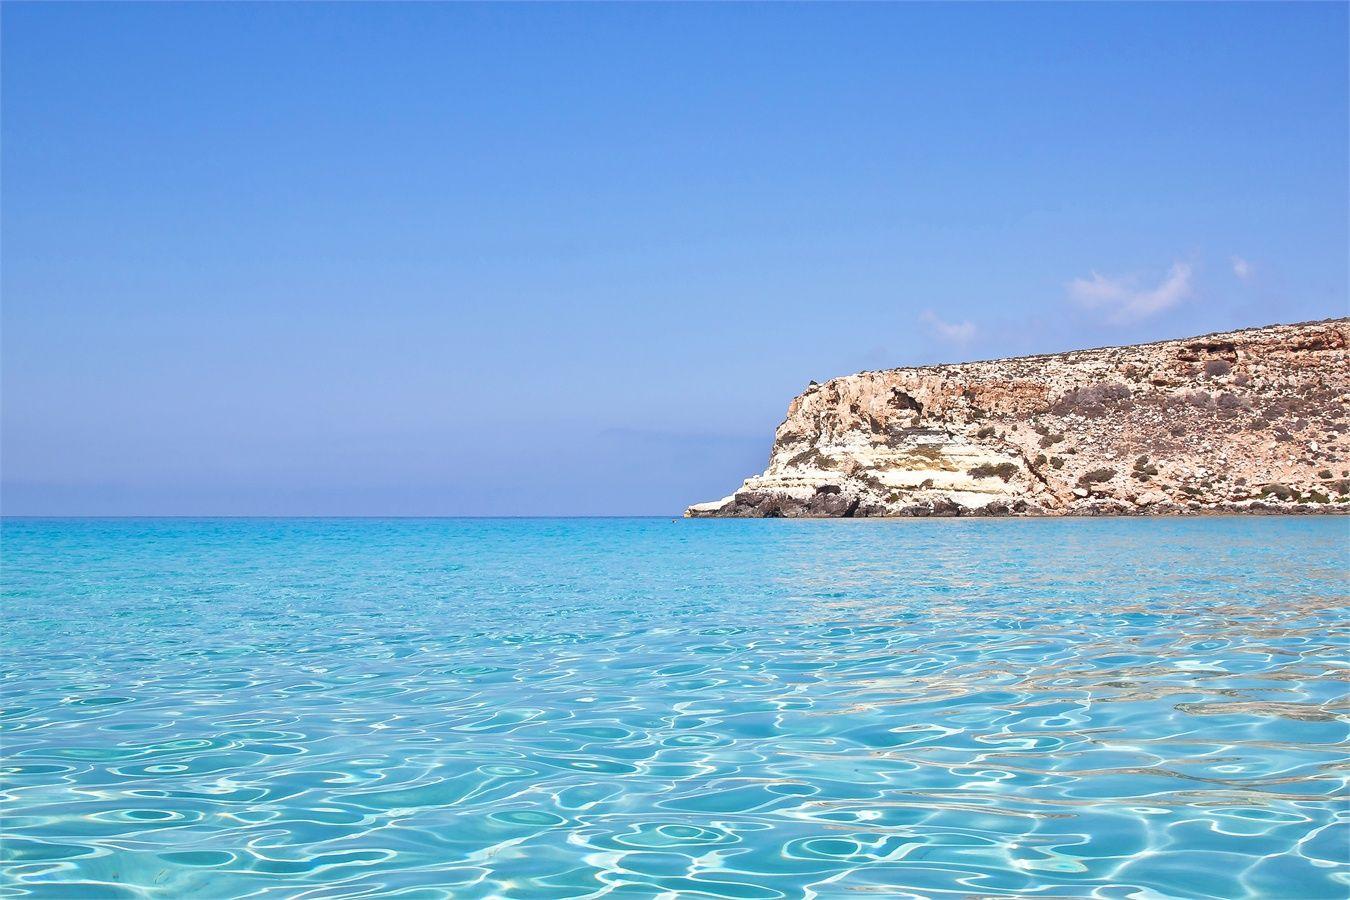 Le spiagge più belle del mondo - VanityFair.it